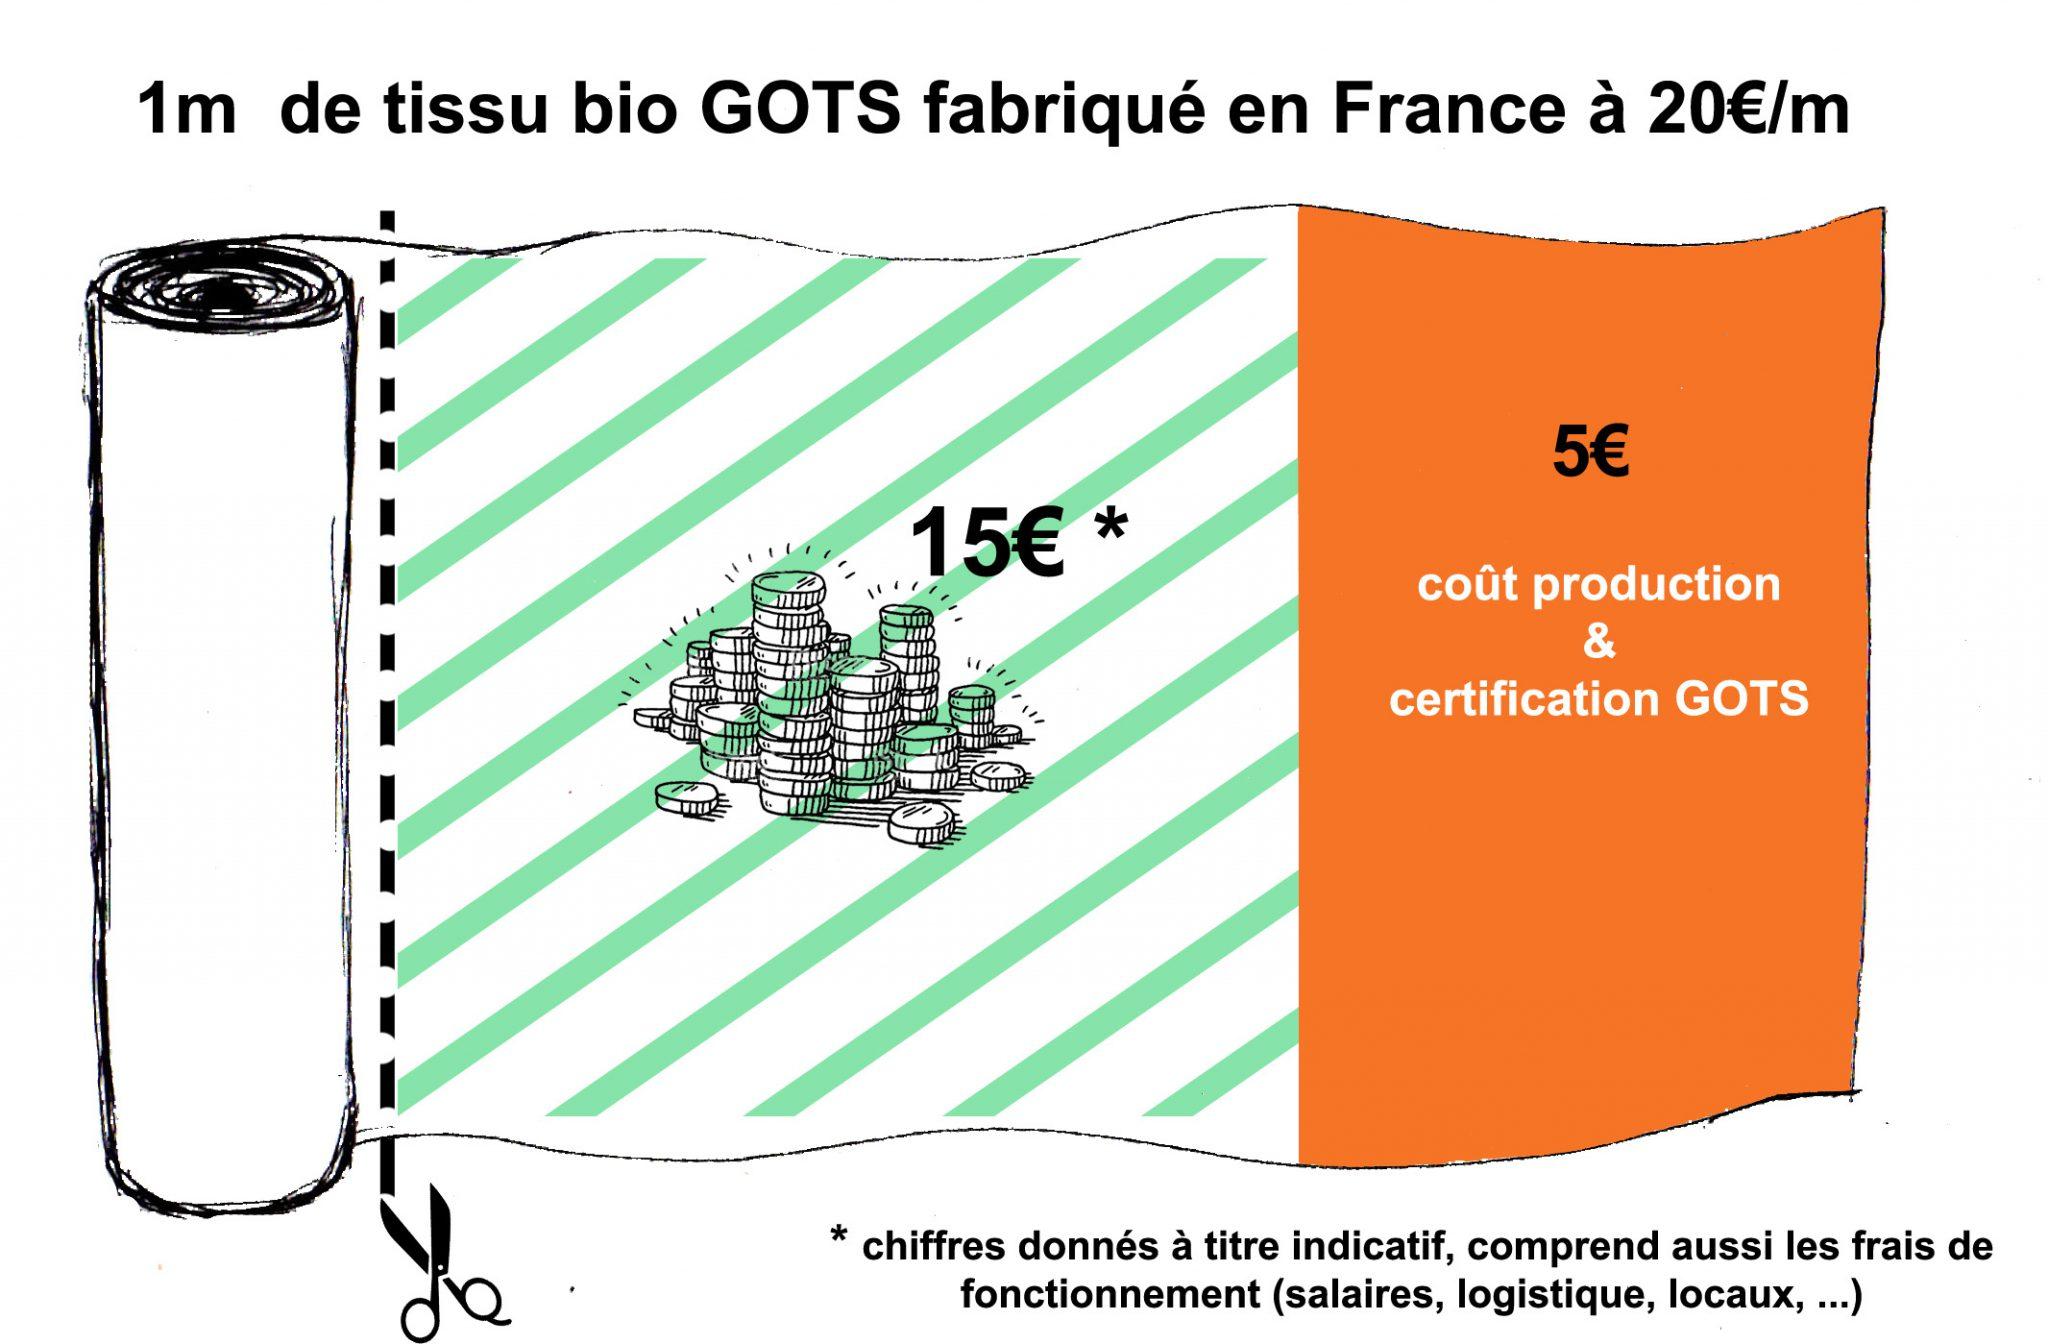 Coûts 1m de tissu - France